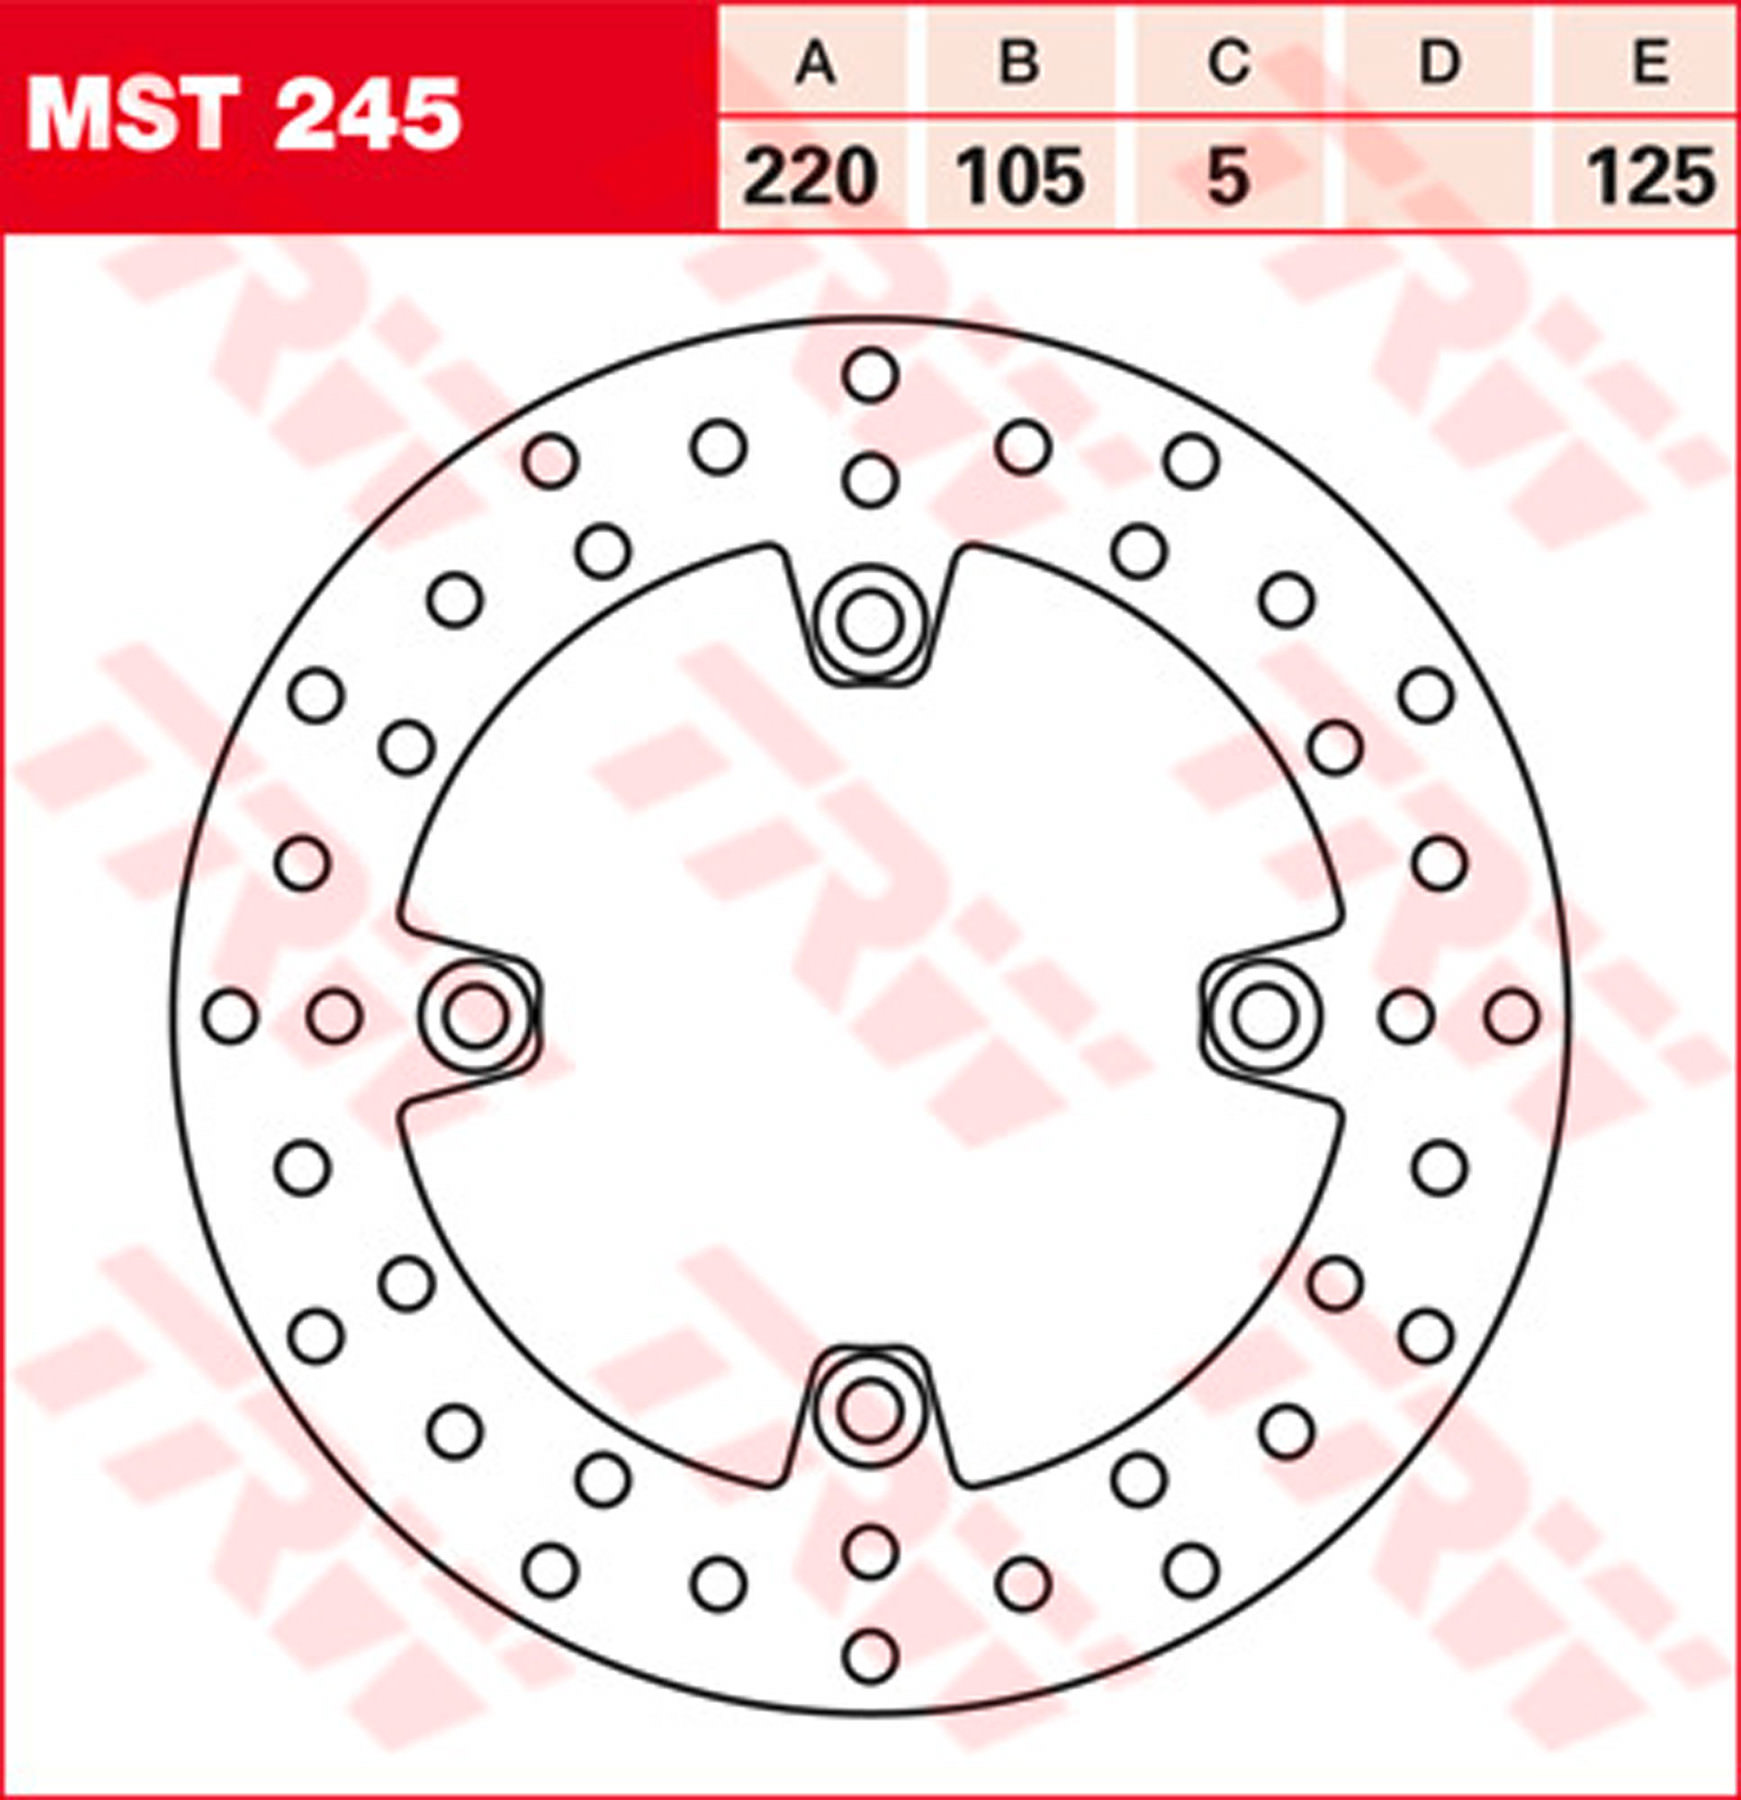 TRW Bremsscheibe MST330 TRW-Lucas